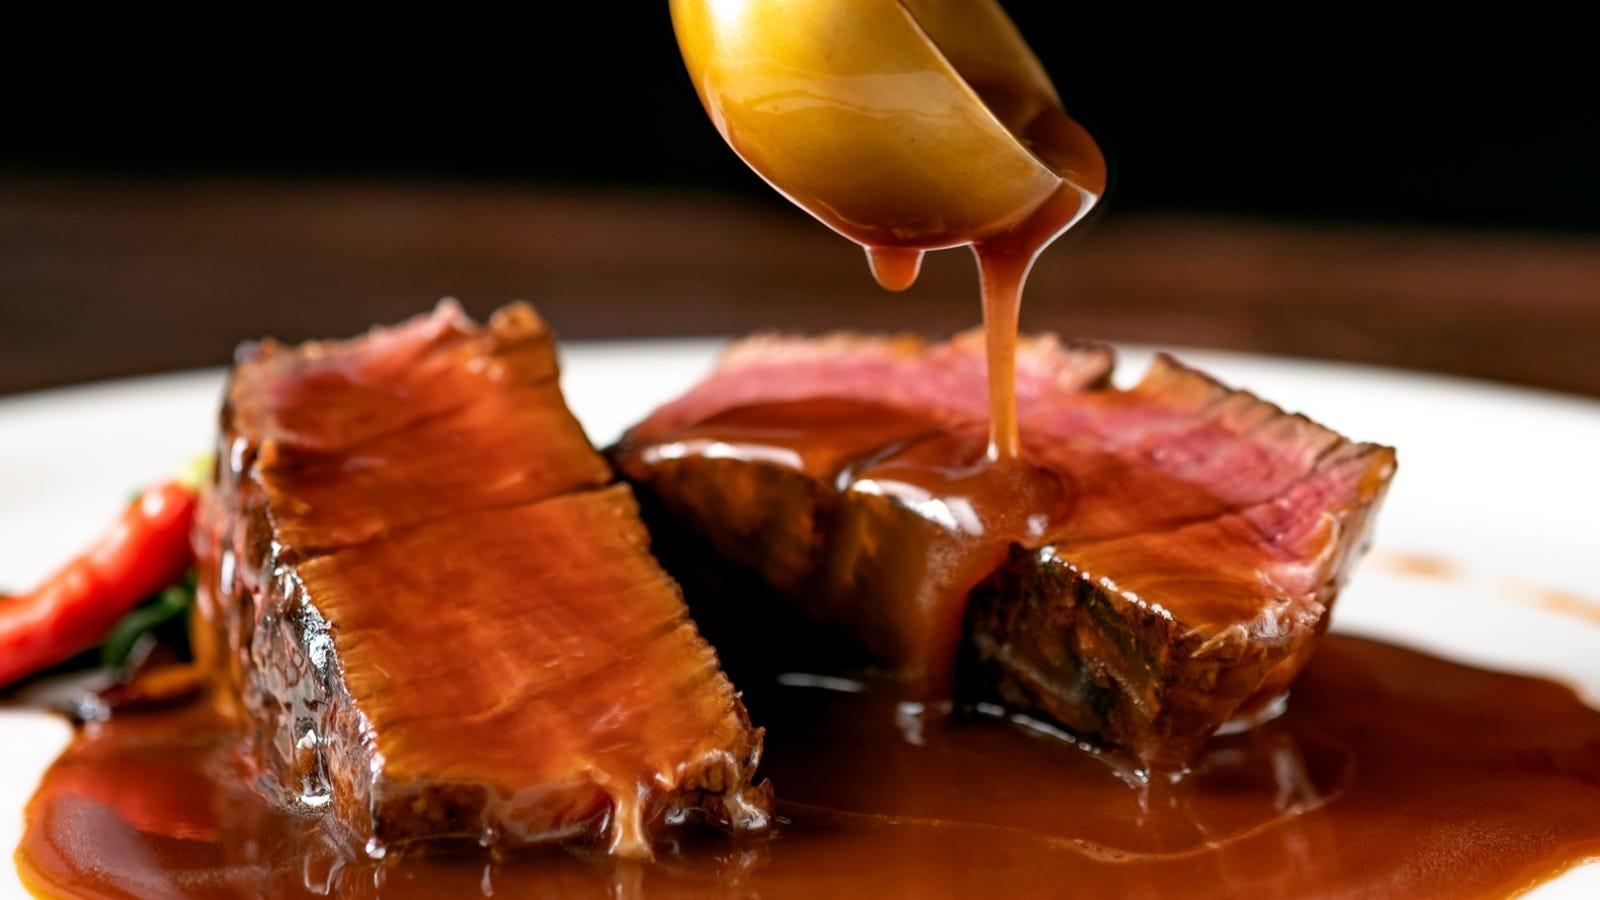 Pouring demi-glace over a sliced filet mignon steak.